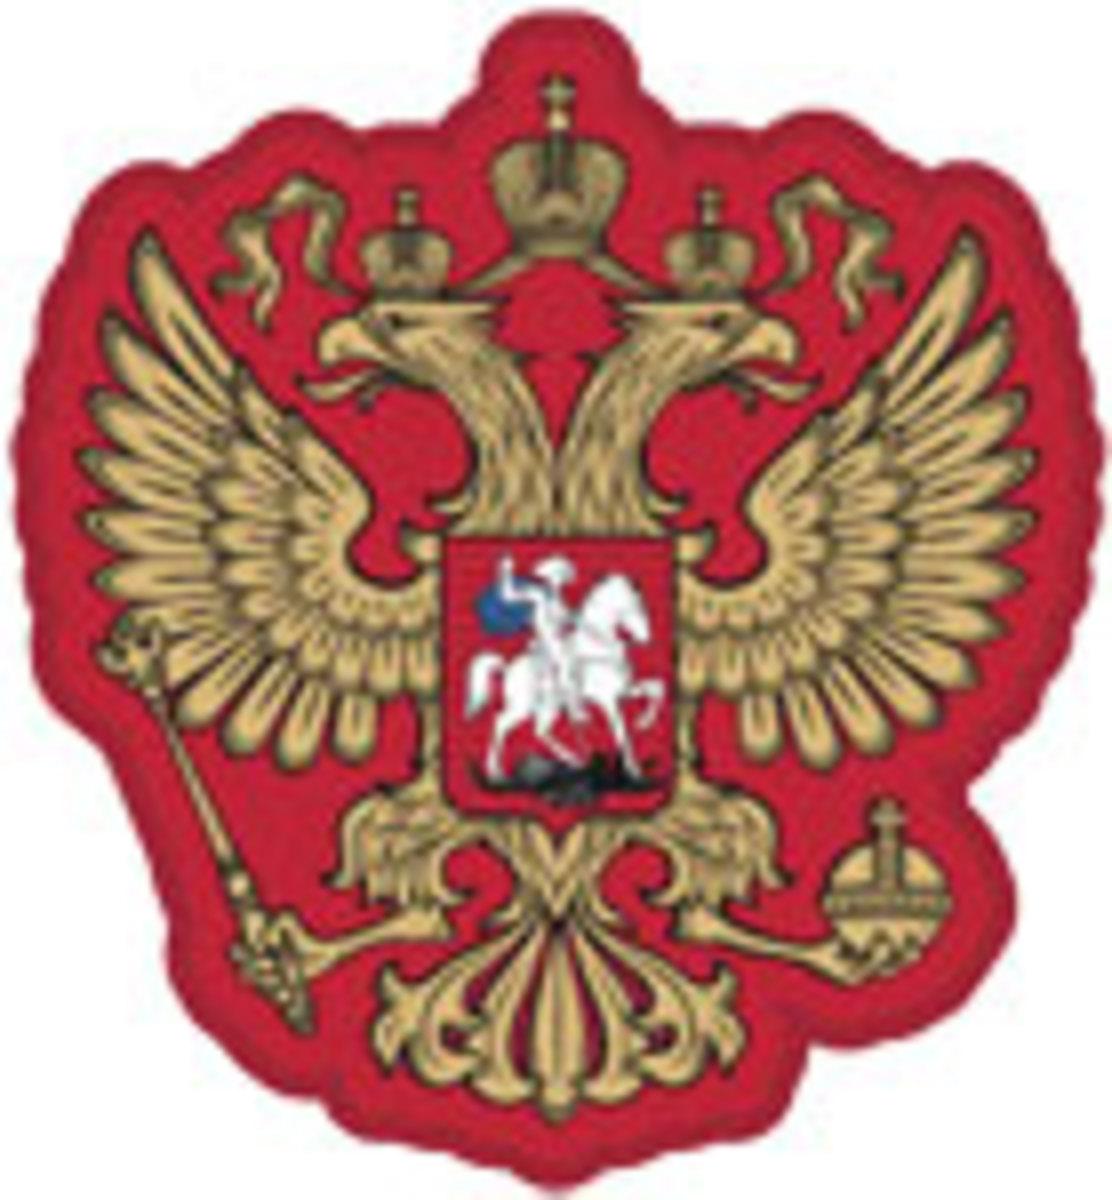 russia-world-cup-logo.jpg